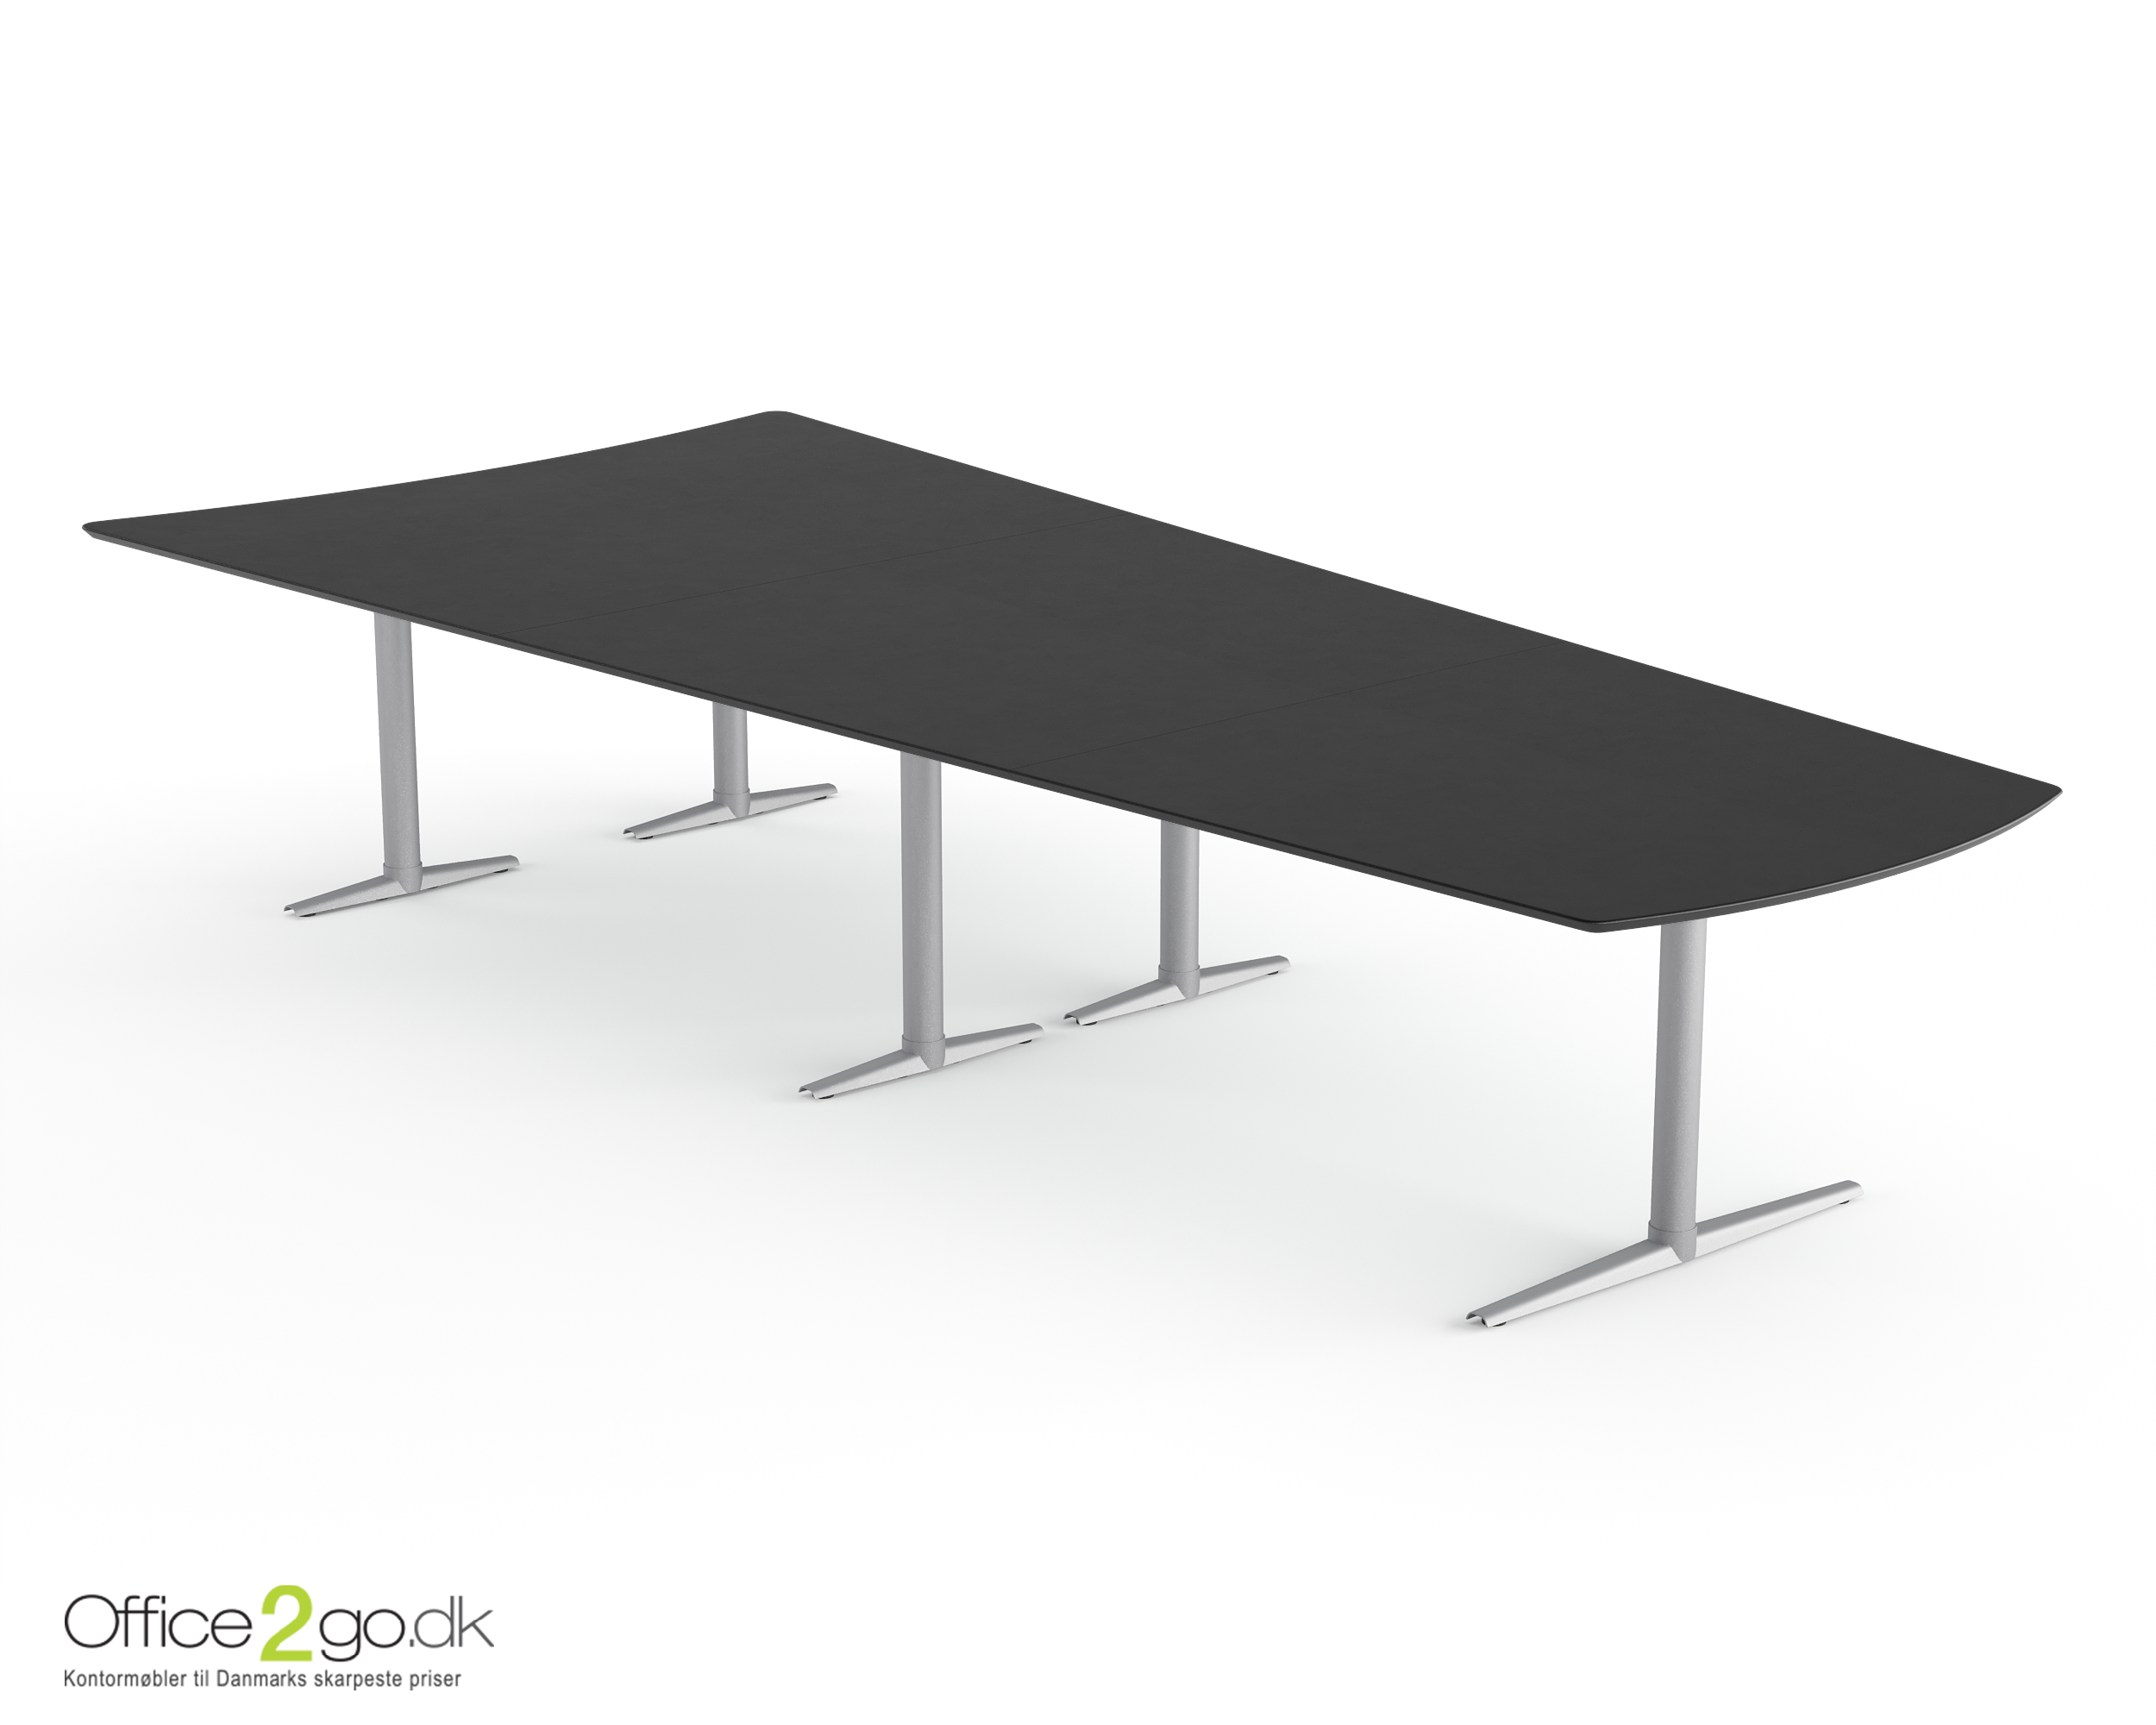 Switch Media mødebord - 12 personer - 375 cm.